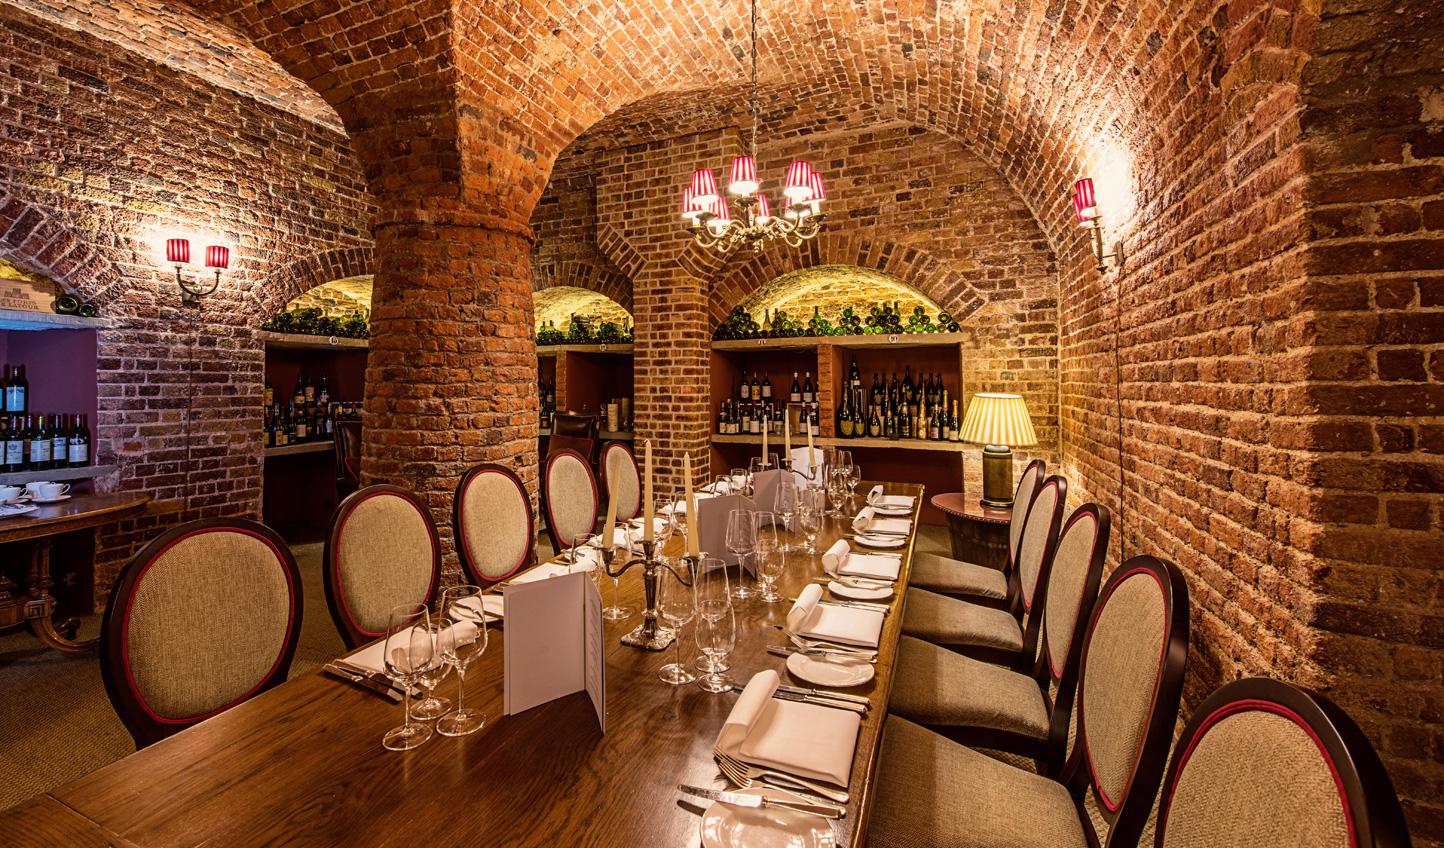 A more romantic dinner setting